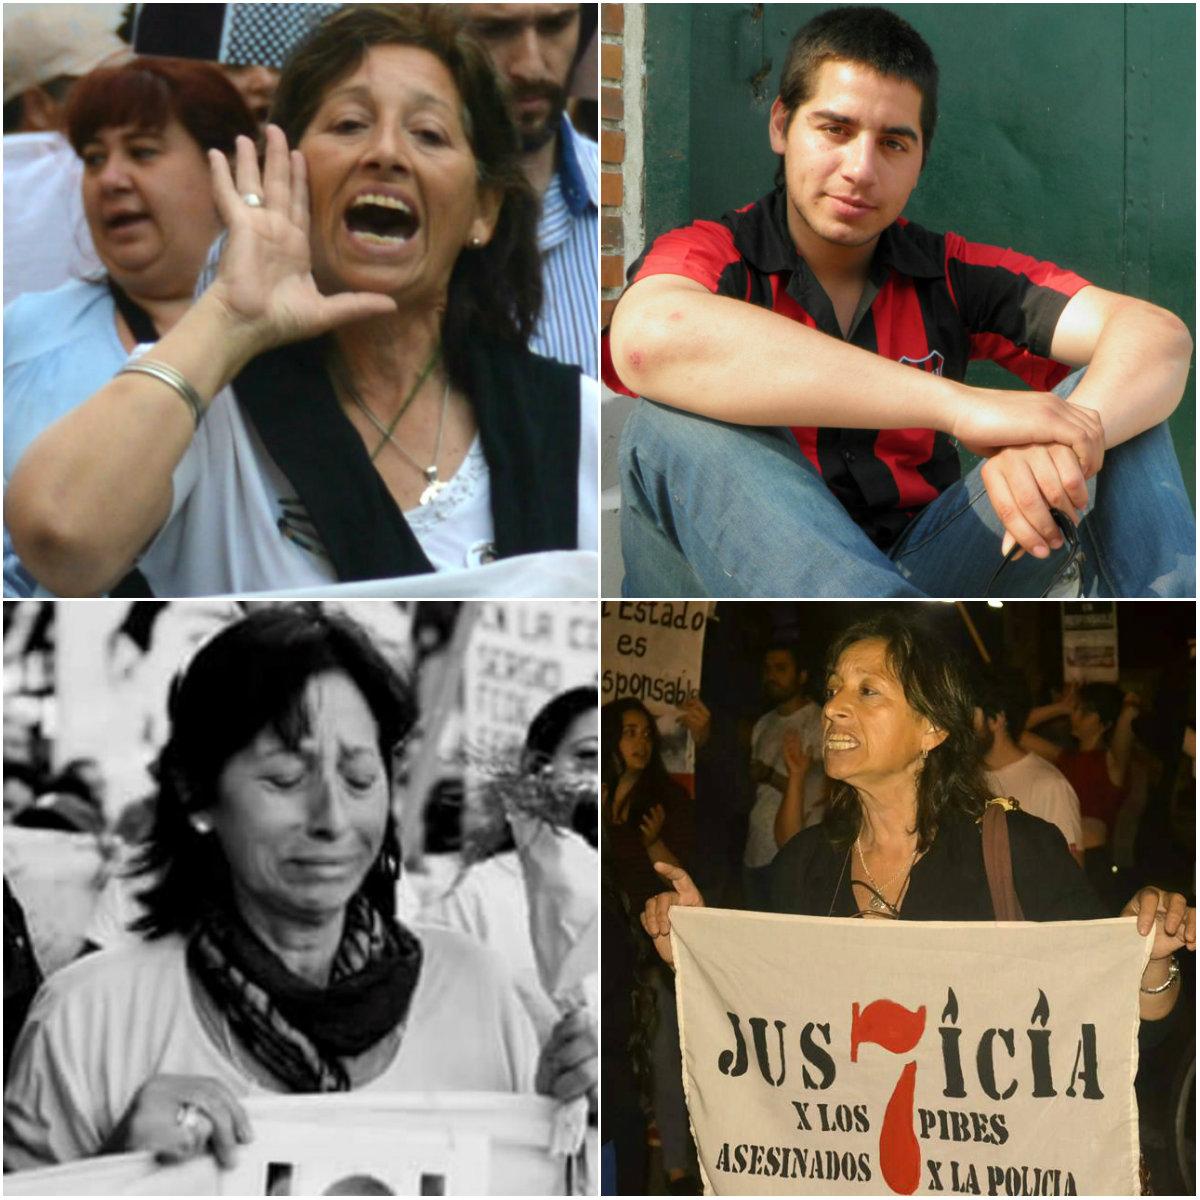 Fotos solidarias: Arriba, derecha: Carmen Rodandelli. Arriba izquierda: Rocío Gutiérrez. Abajo, derecha: Fotografia Doble A. Abajo, izquierda: Agustín Correa.